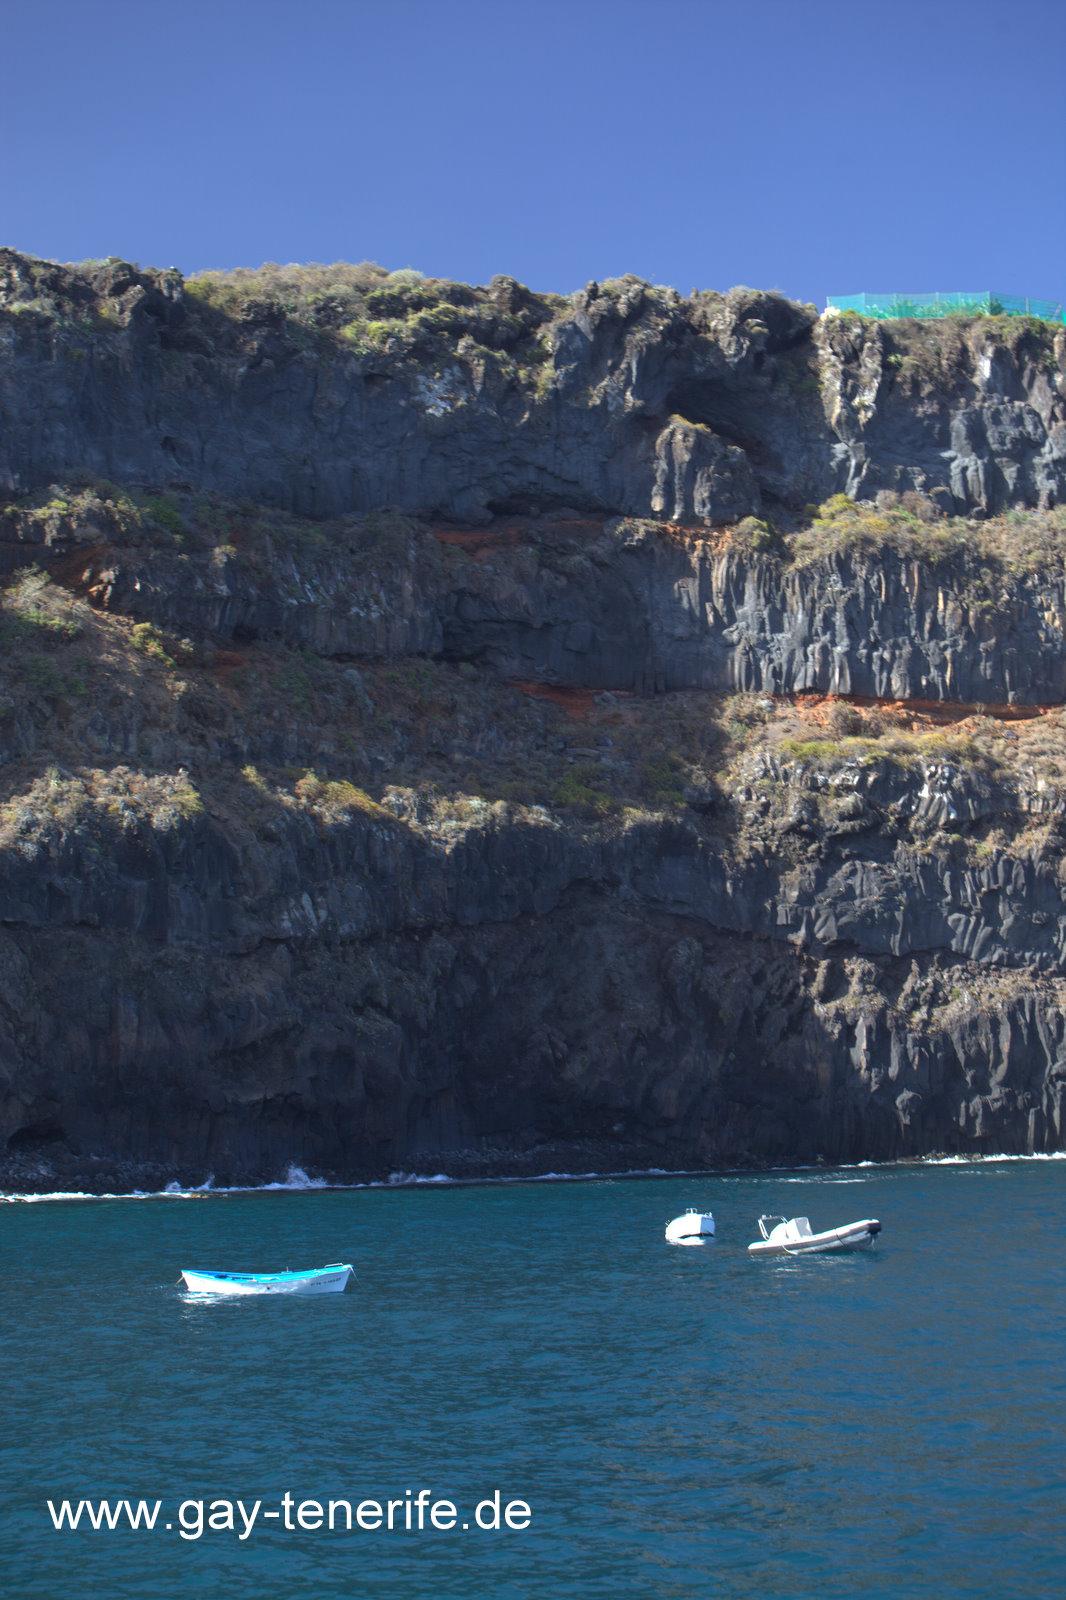 Gay -Tenerife.de: Playa San Marcos auf Teneriffa